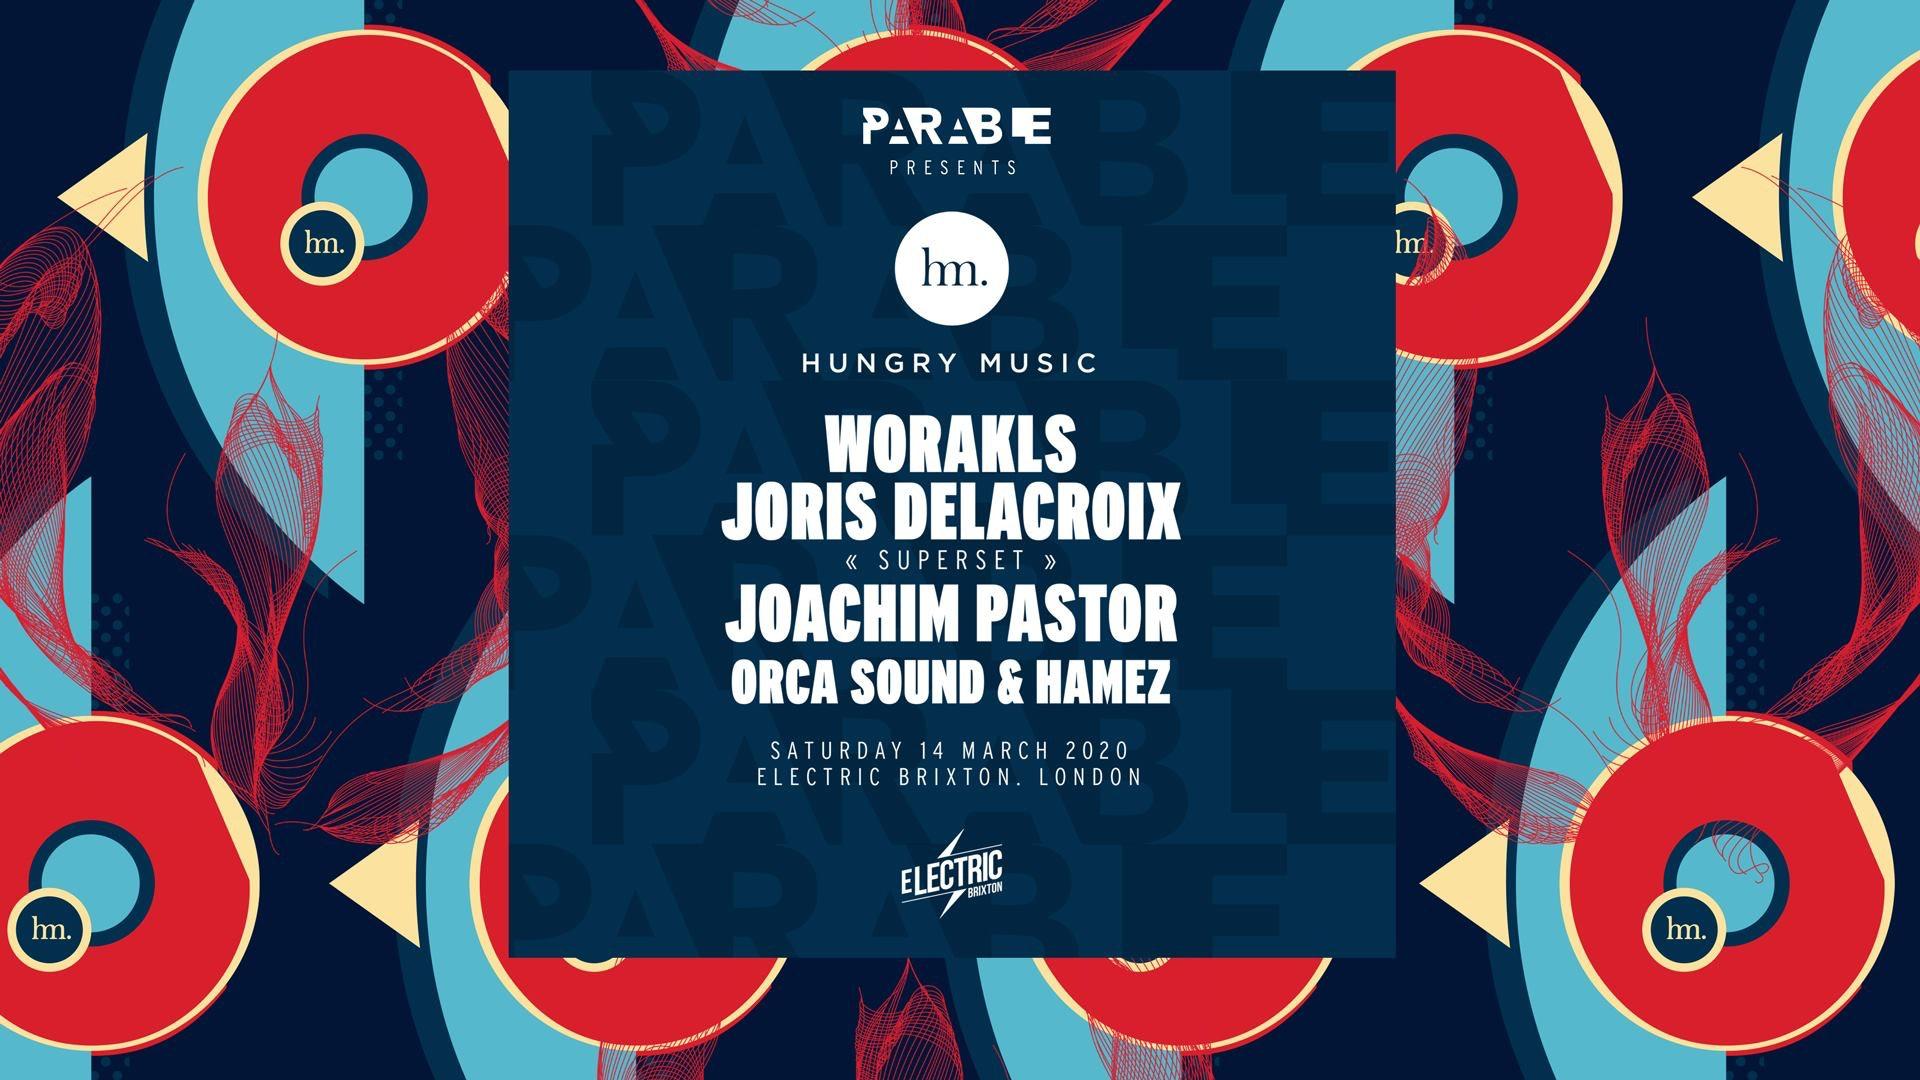 Hungry Music x Parable – Worakls, Joris Delacroix, Joachim Pastor & More